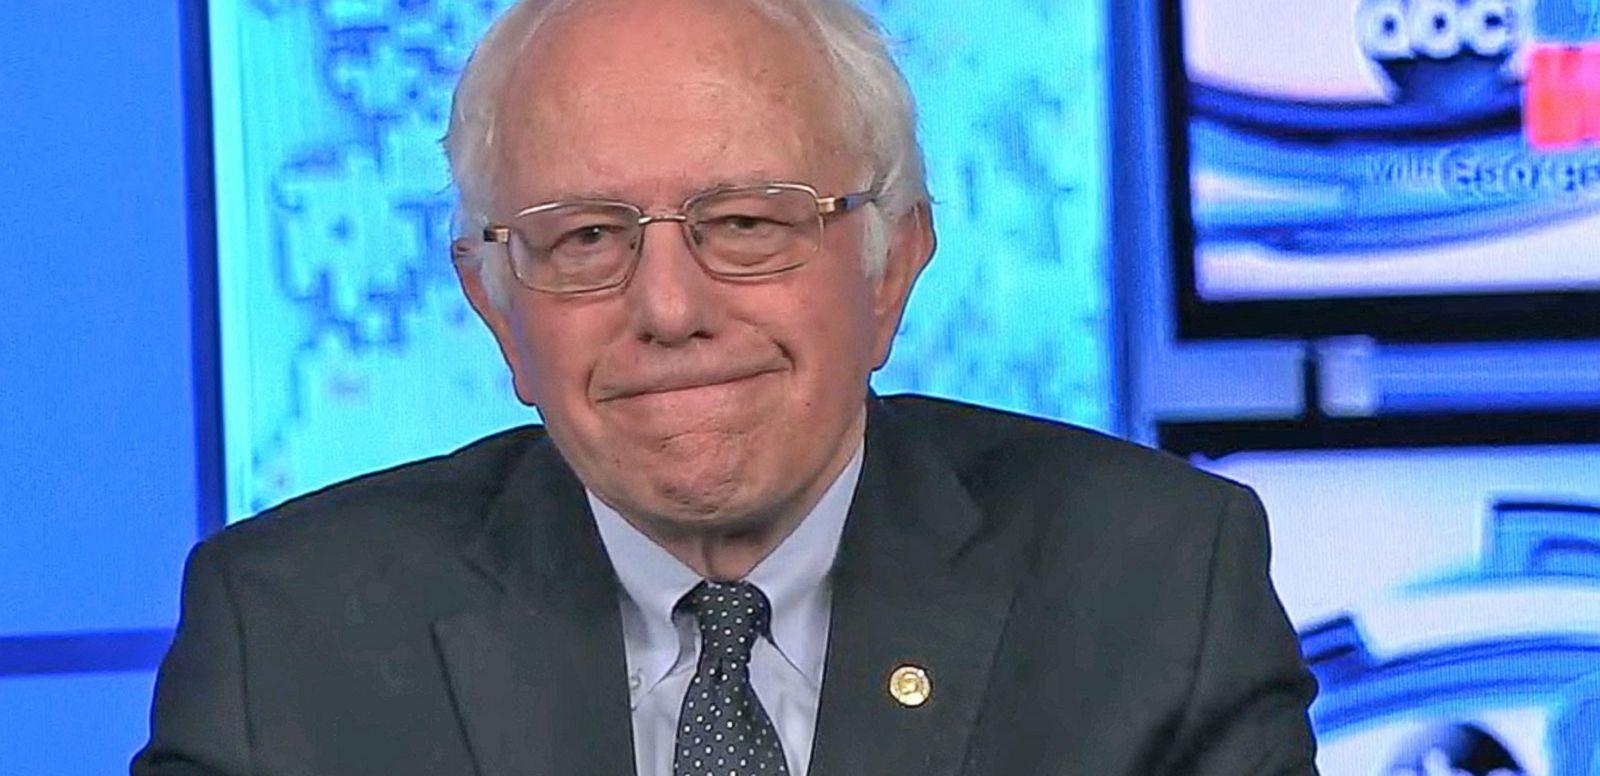 VIDEO: Bernie Sanders on 2016 Democratic National Convention